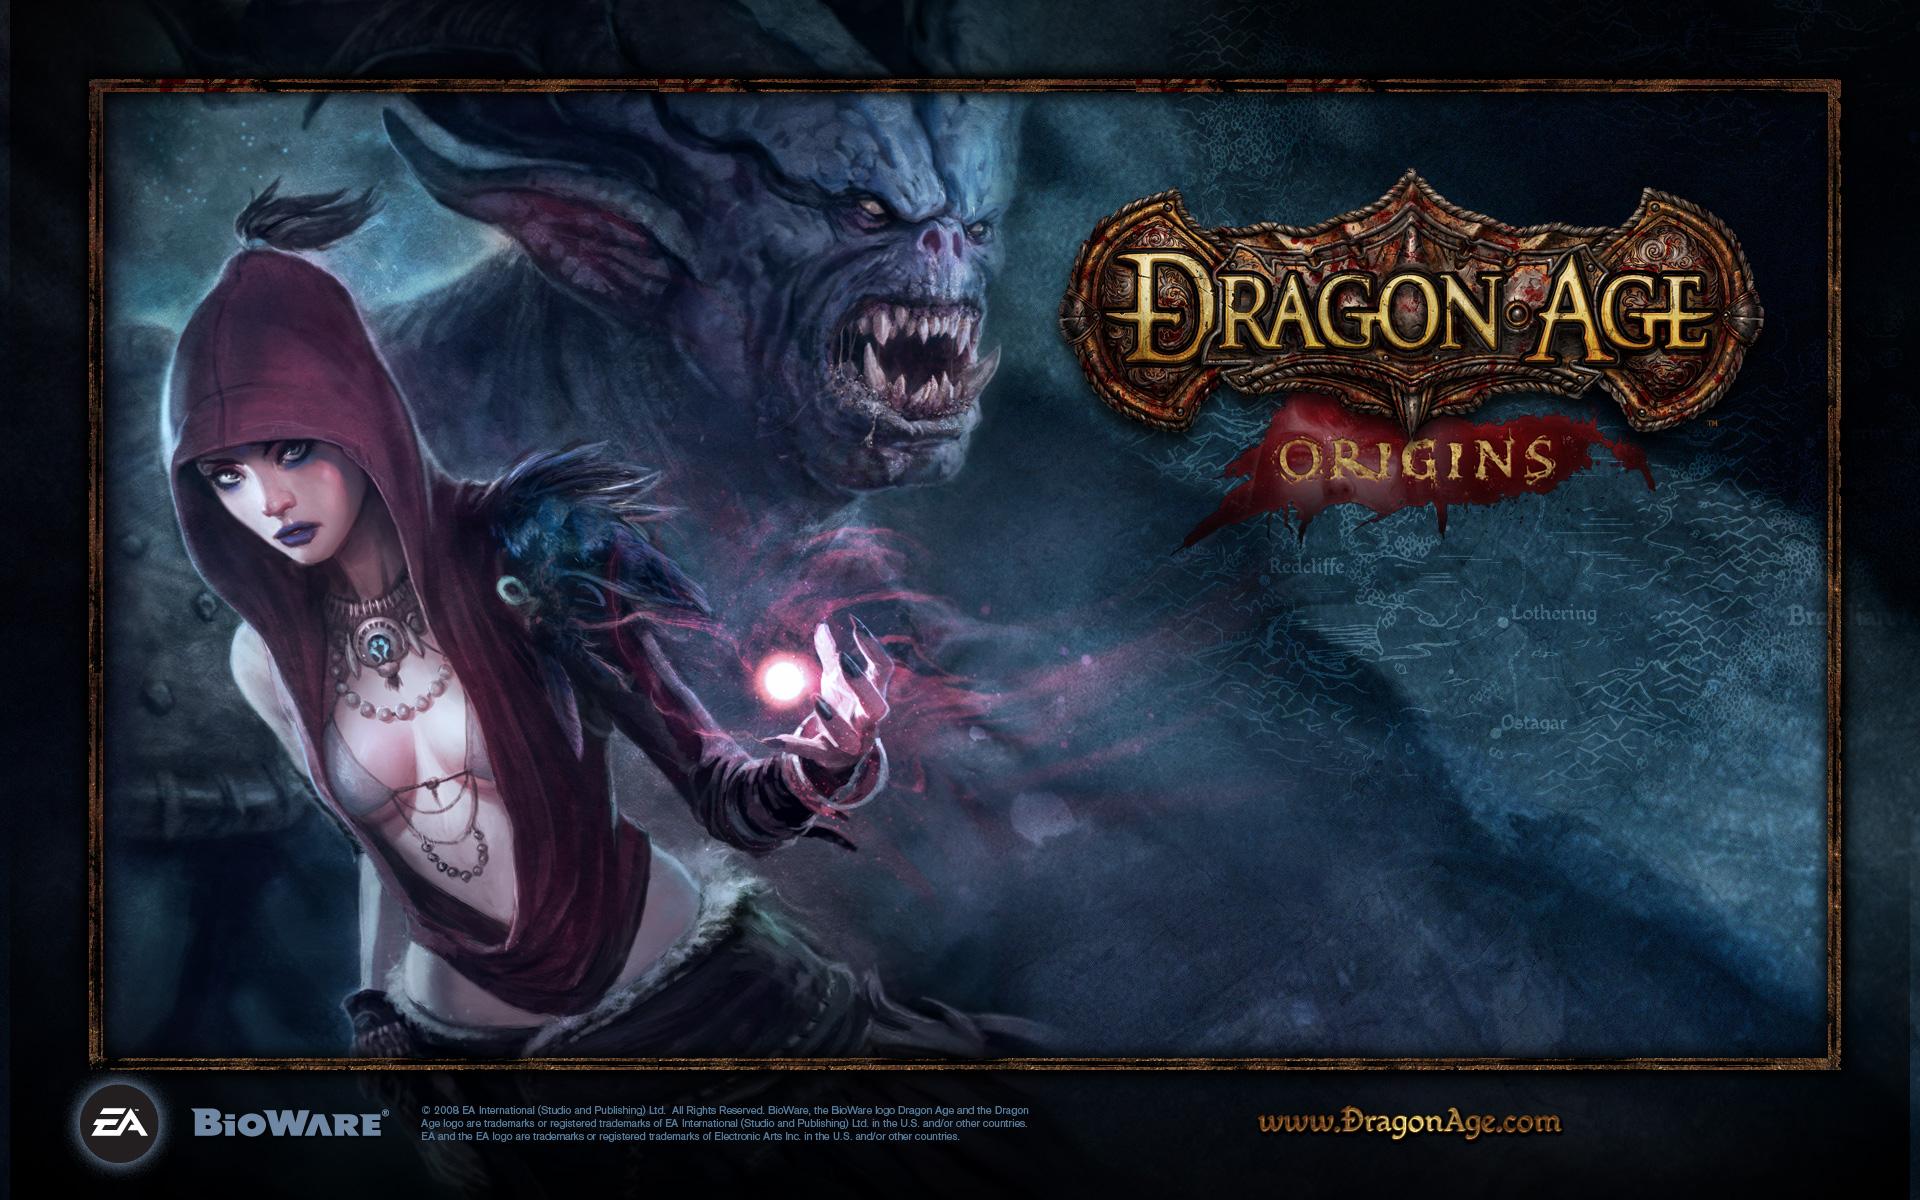 Dragon age пятый член группы